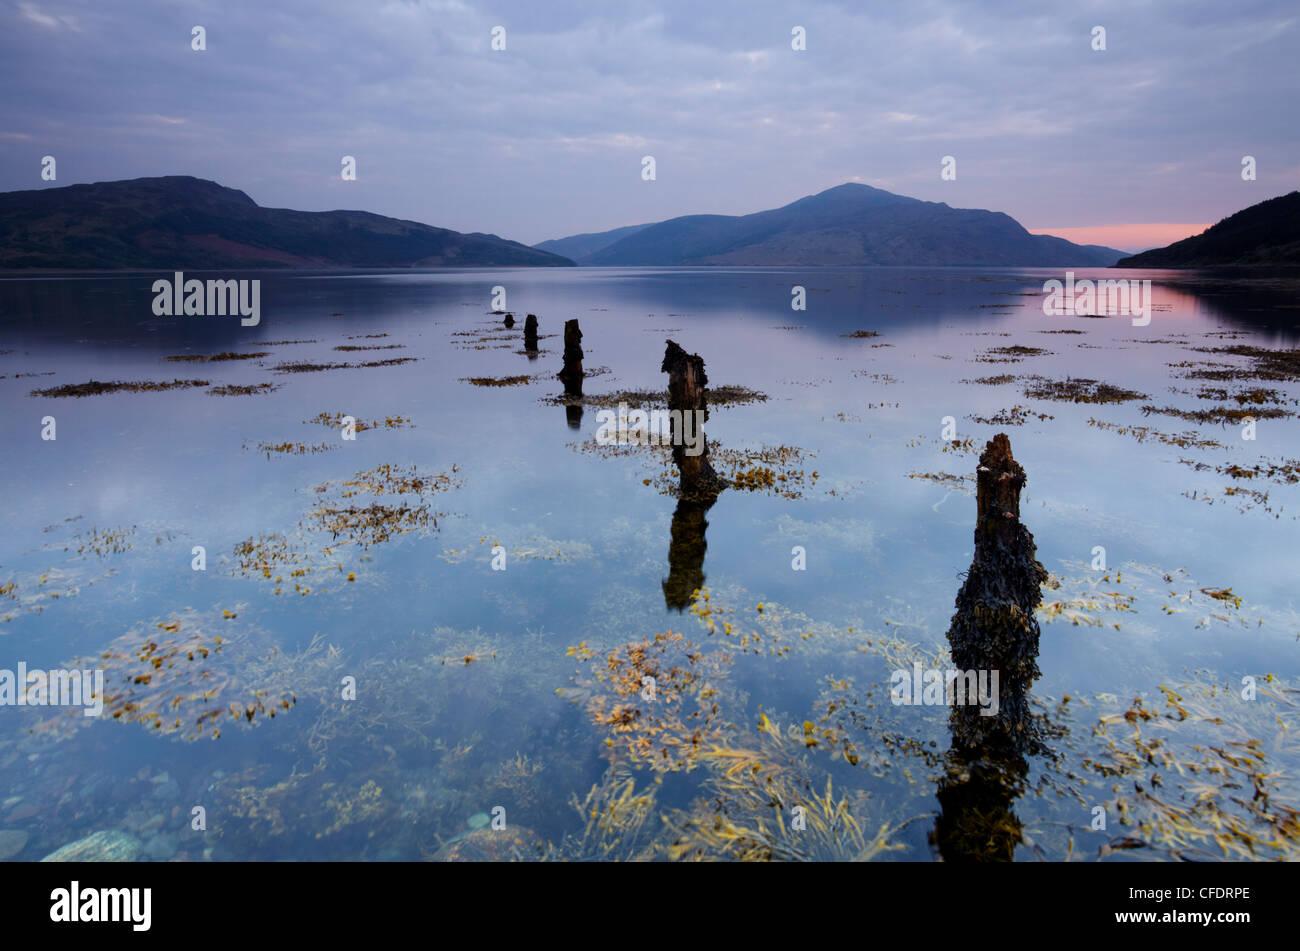 A view of Loch Alsh taken at the shoreline near Kirkton, Lochalsh, Scotland, United Kingdom, Europe - Stock Image